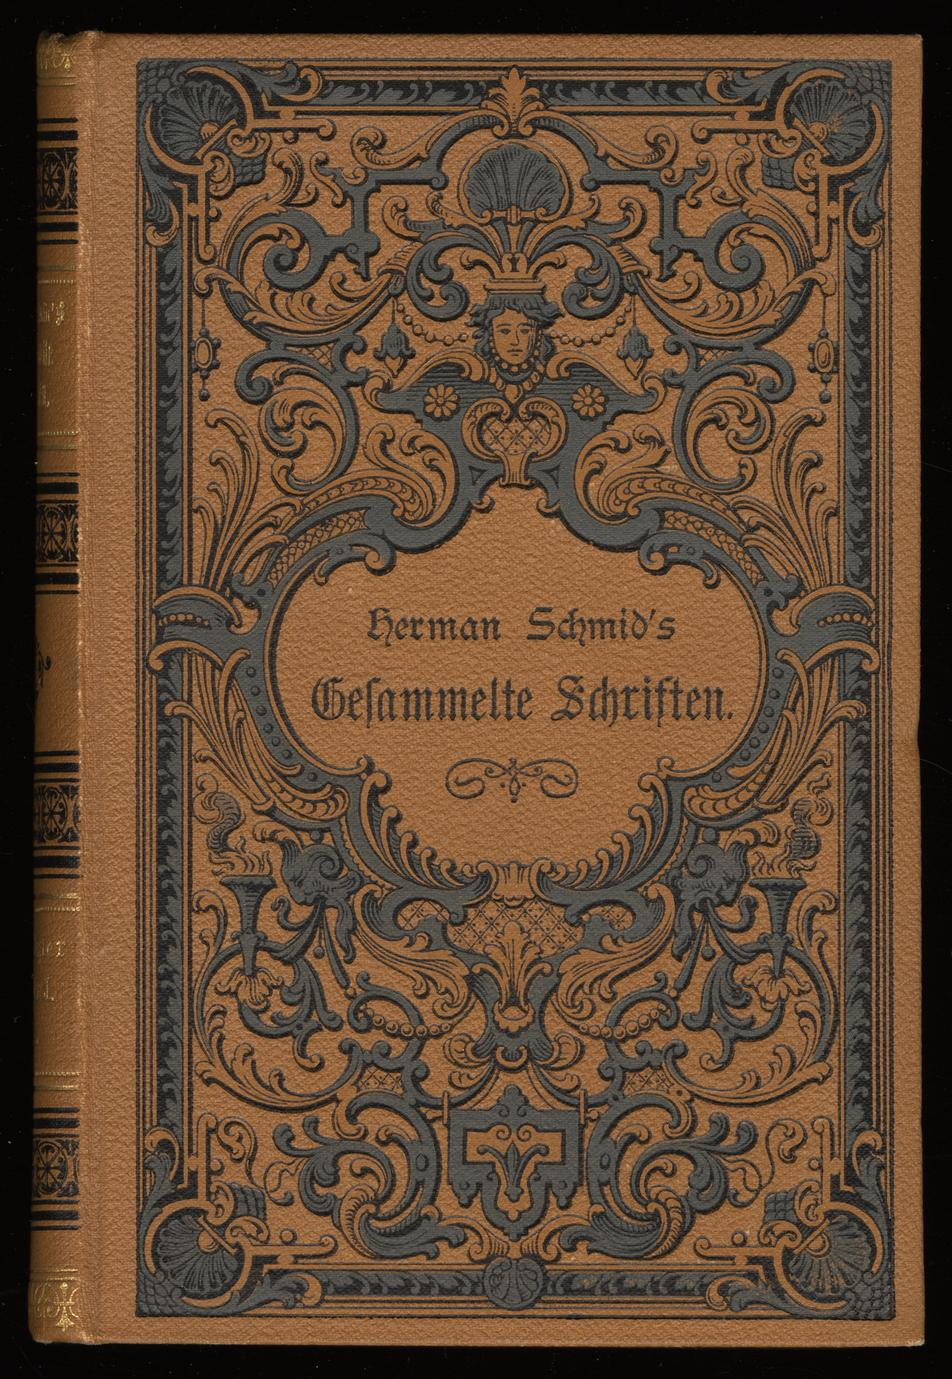 Herman Schmid's gesammelte Schriften; v. 3-4 (1 of 3)